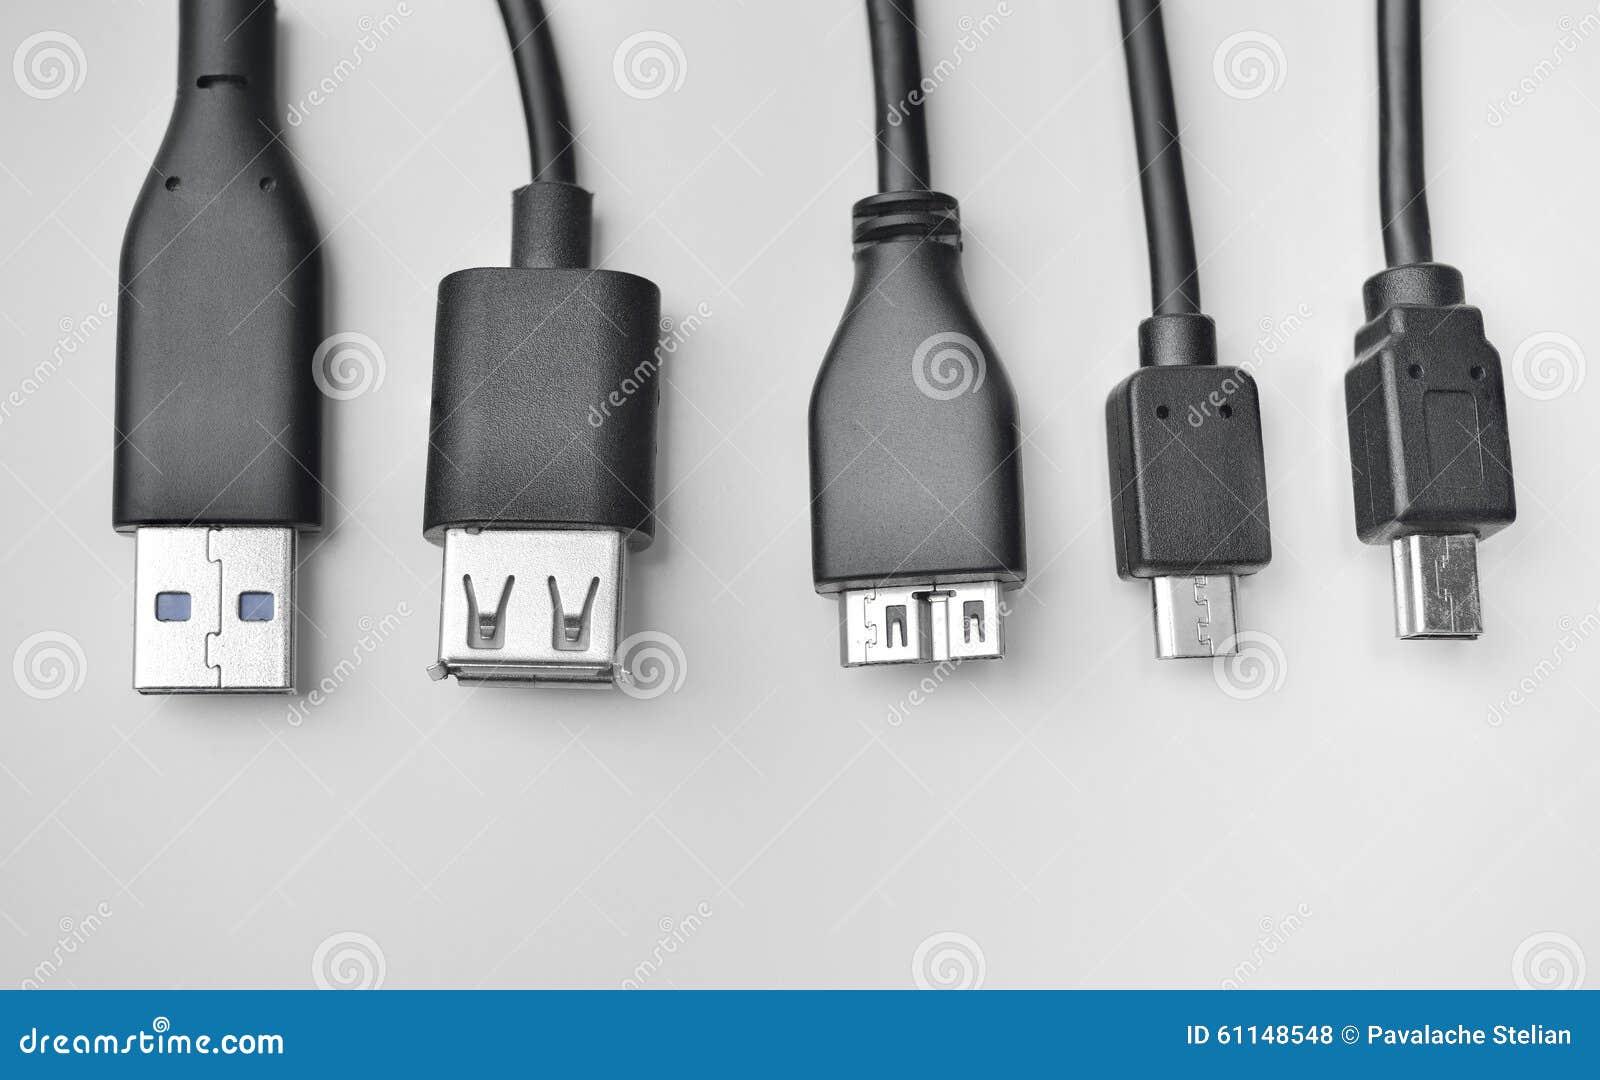 kabel usb mini usb en micro usb stock foto afbeelding bestaande uit modem aansluting 61148548. Black Bedroom Furniture Sets. Home Design Ideas